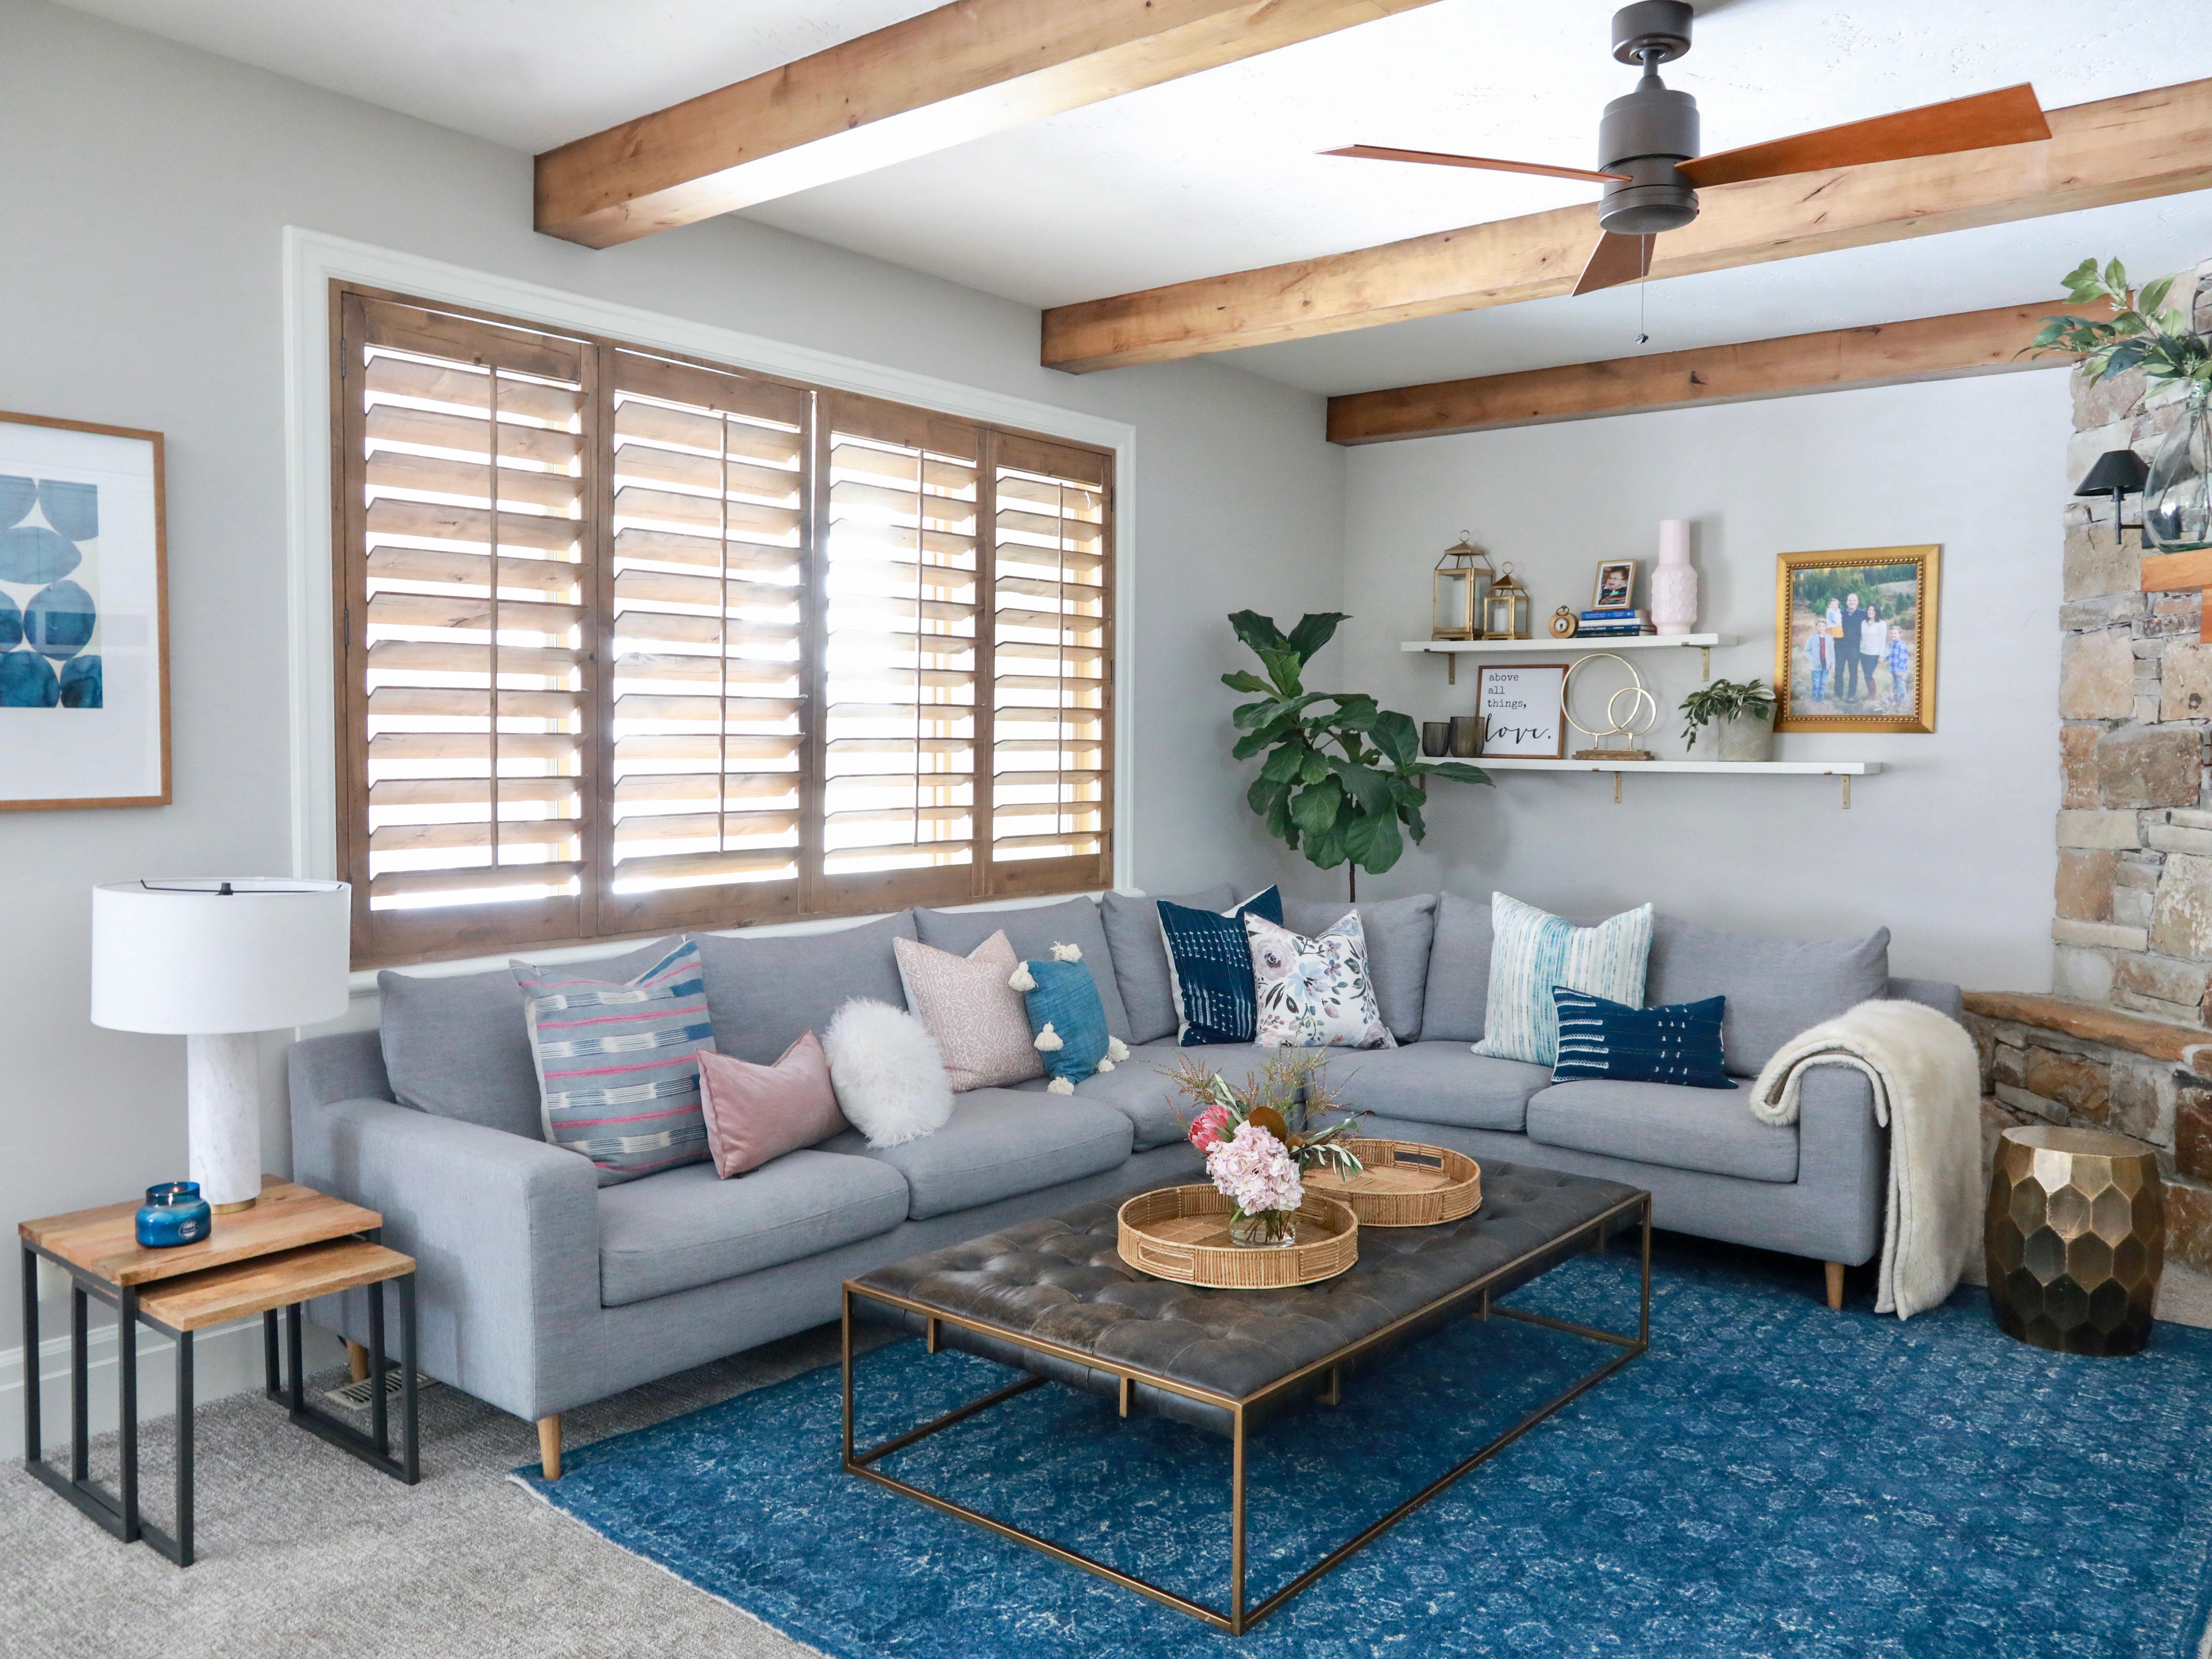 Updated Rustic Modern Family Room - AFP Design